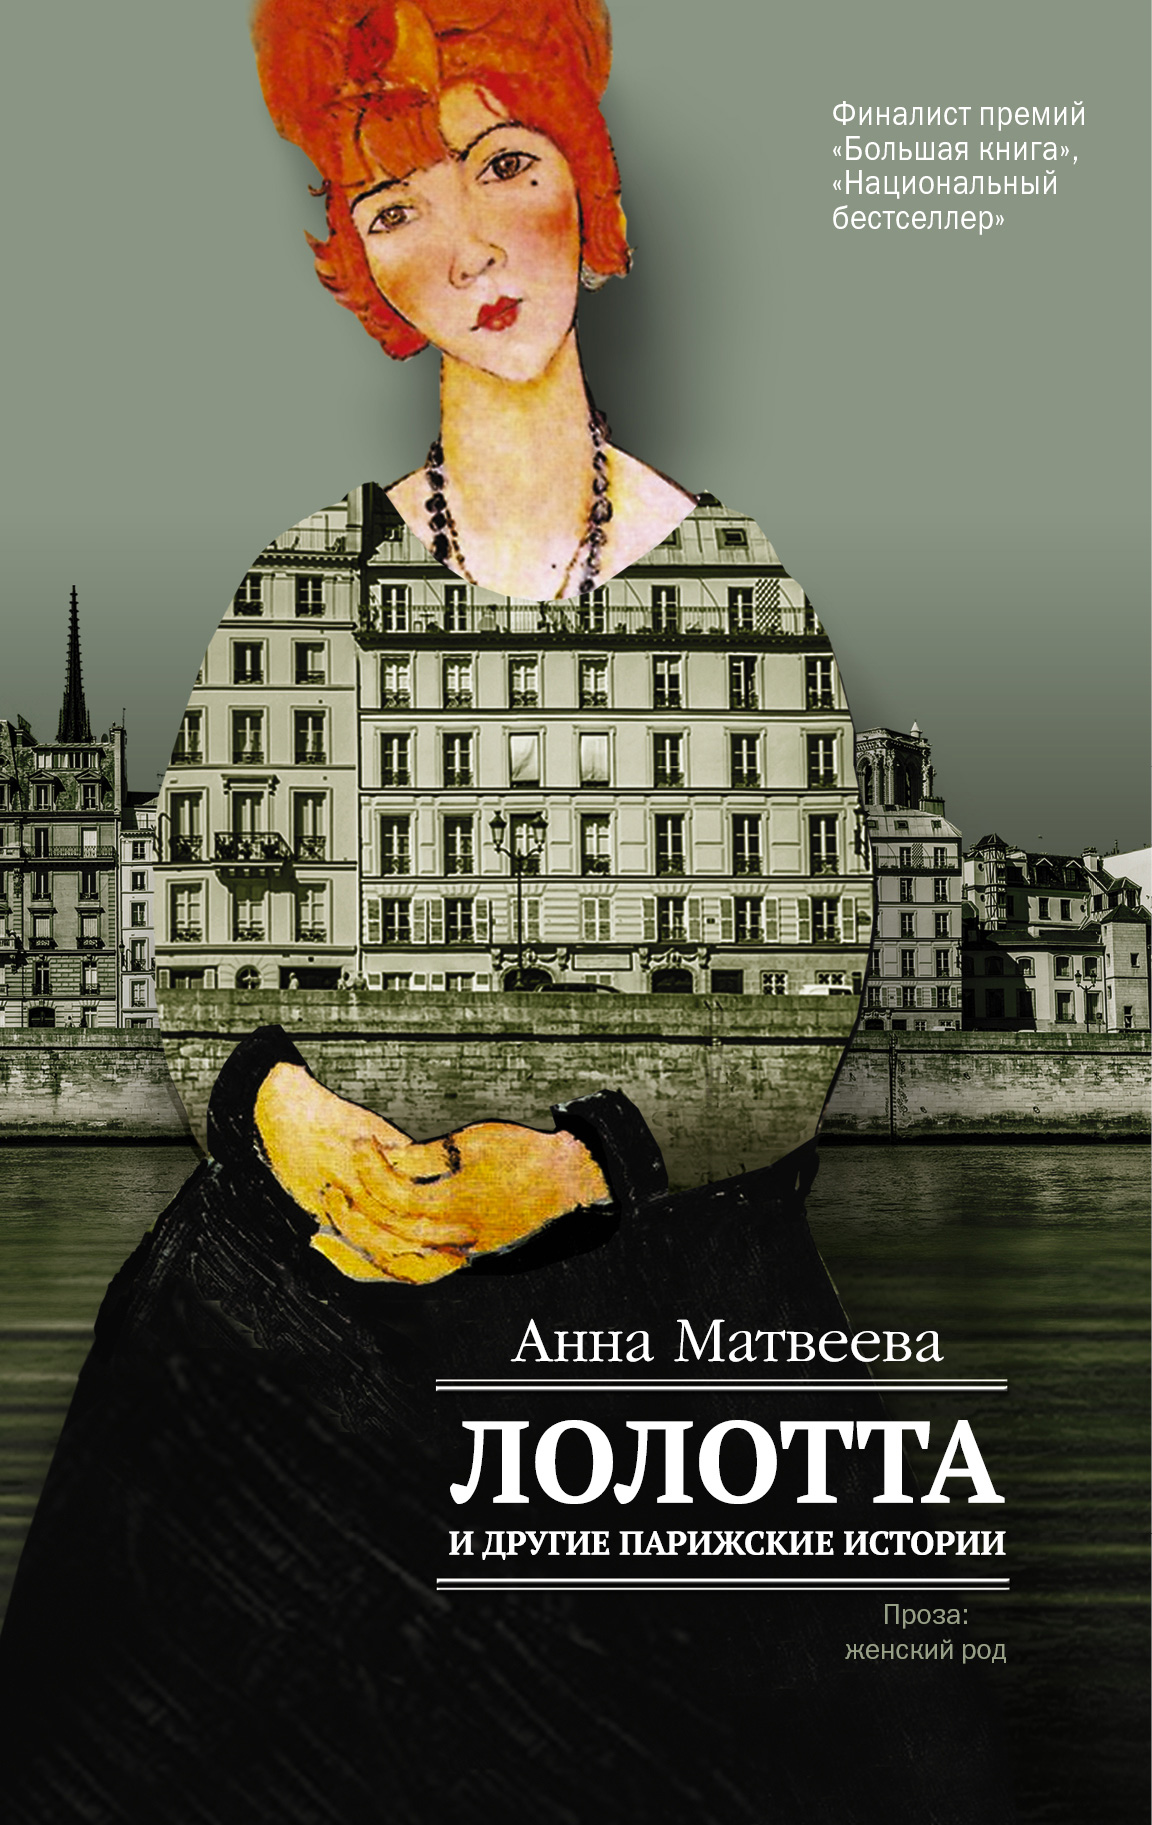 Анна Матвеева Лолотта и другие парижские истории анна матвеева перевал дятлова или тайна девяти